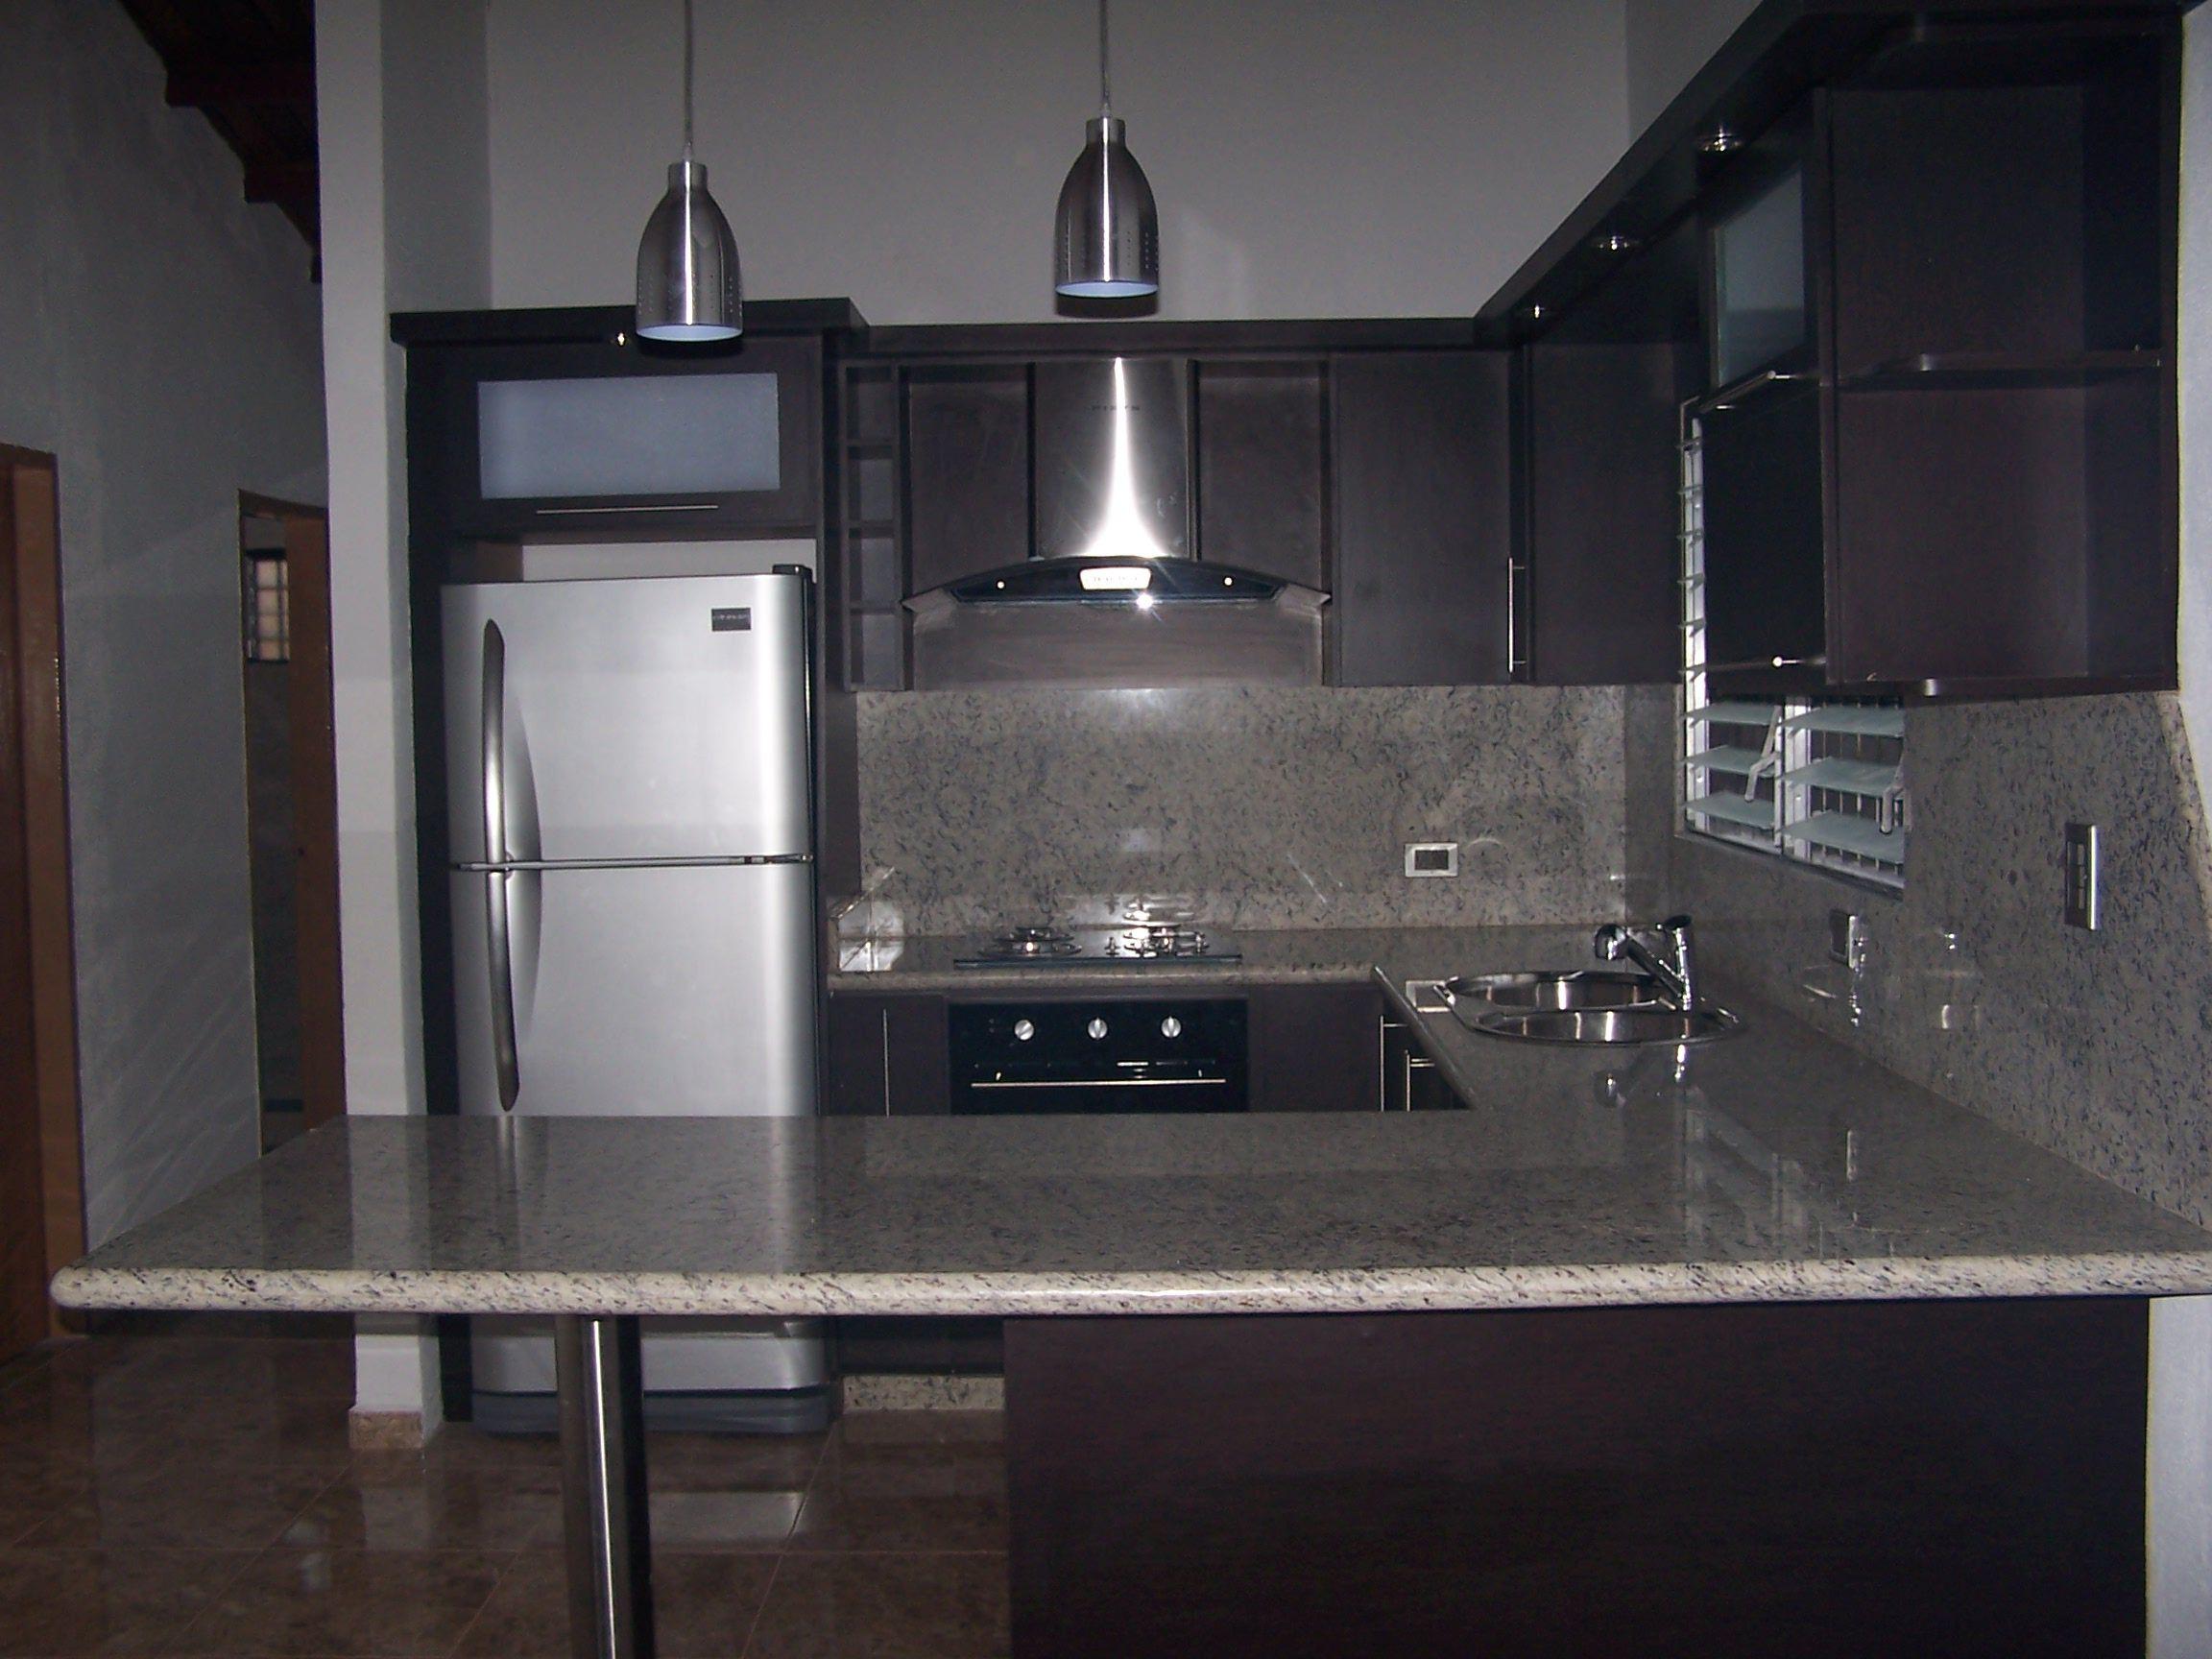 Cocina empotrada moderna color wengue tope en granito for Cocinas de granito